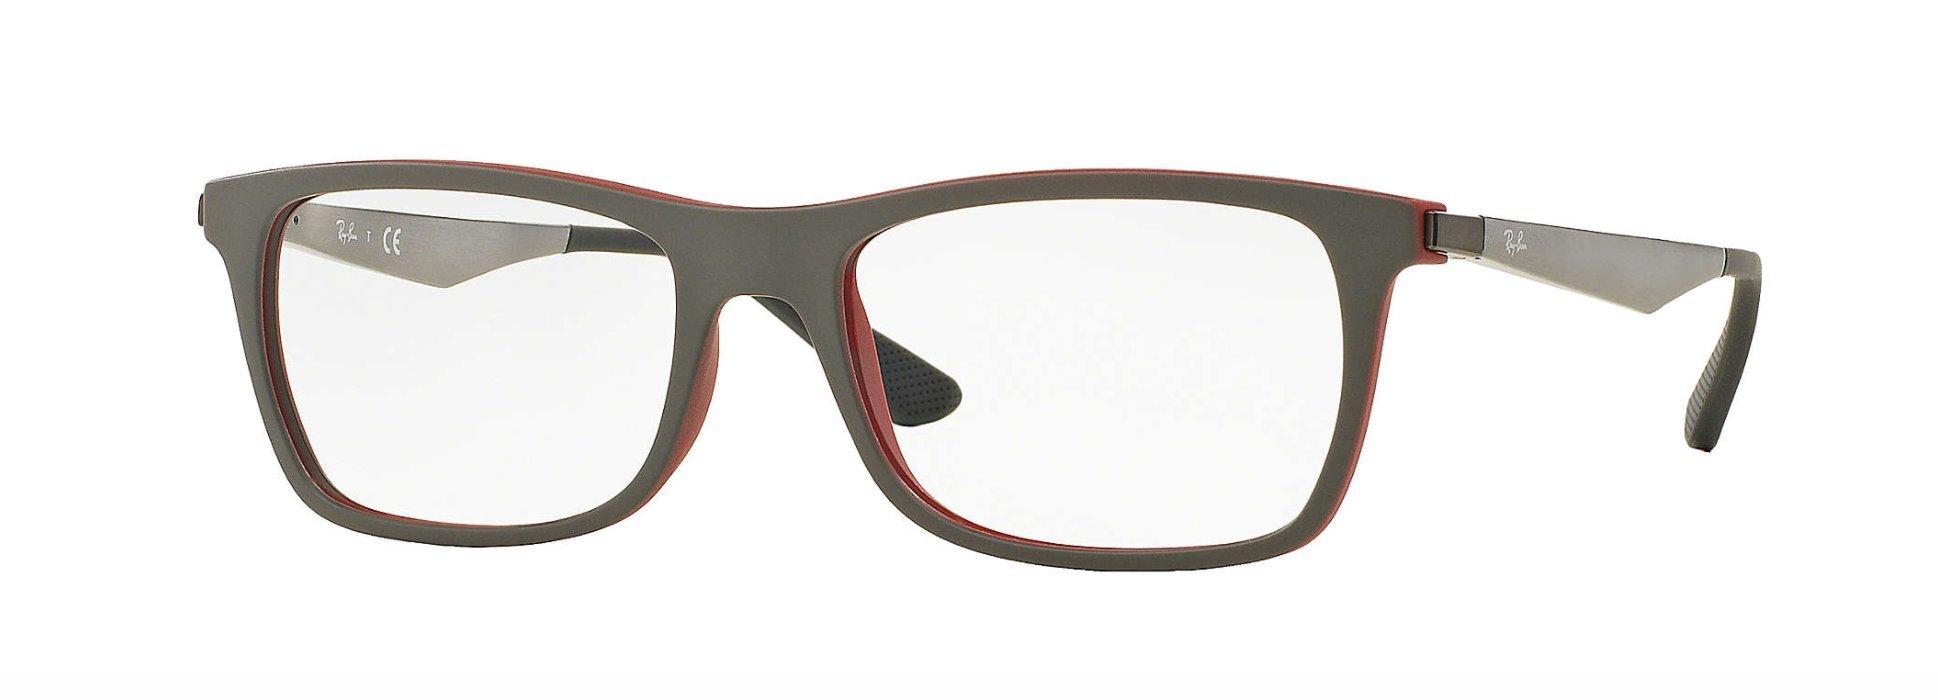 Ray Ban Eyeglasses Rx 7062f 5576 Top Grey On Matte Bordeaux, Size 55-18-145